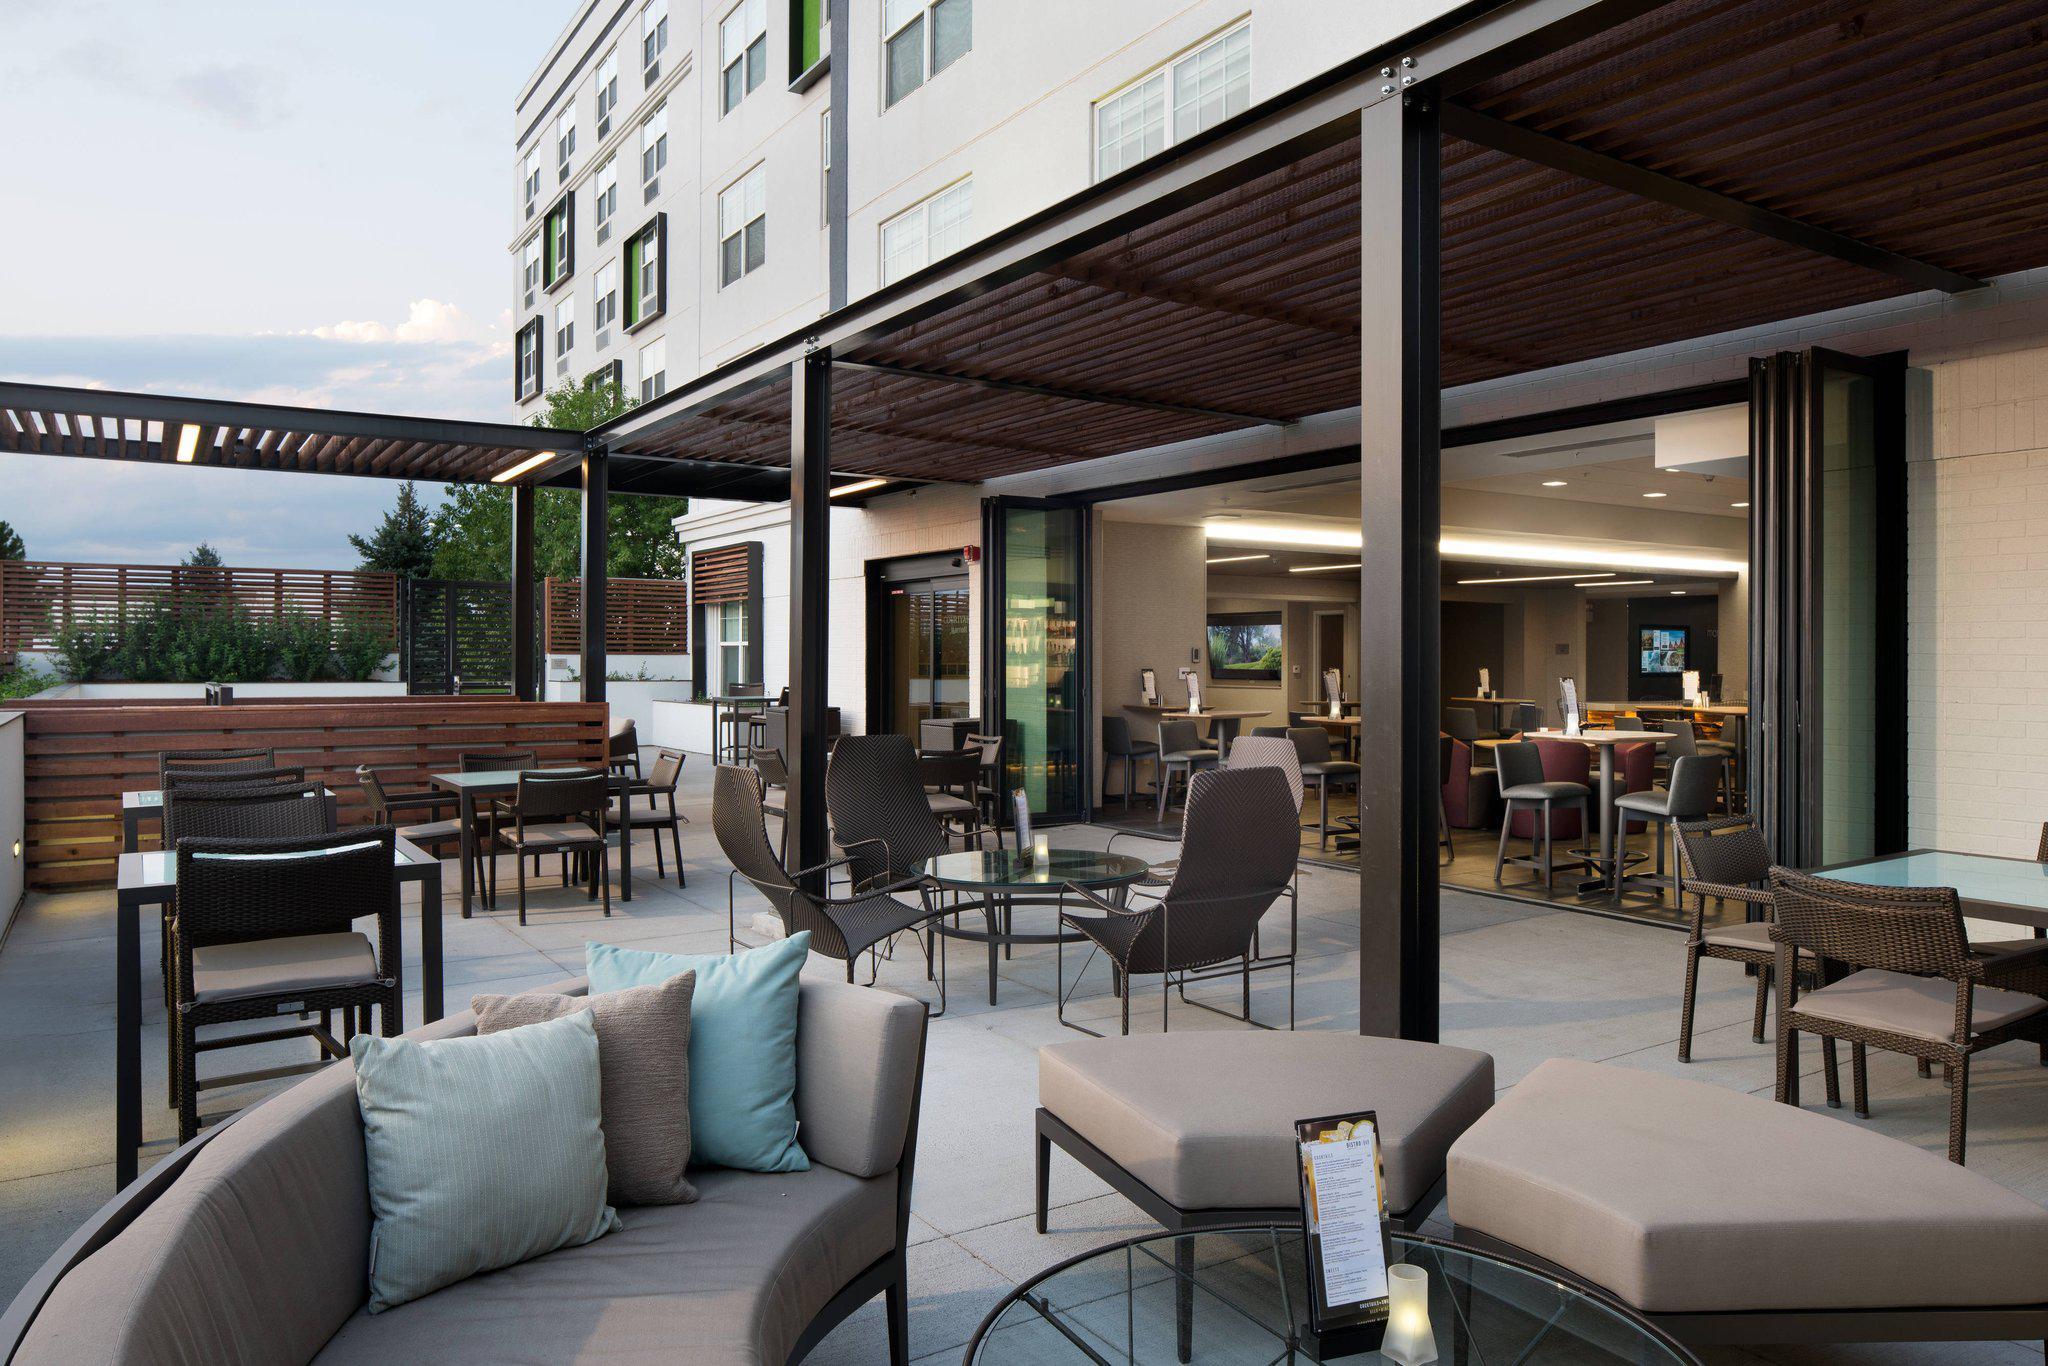 Courtyard by Marriott Denver Airport at Gateway Park